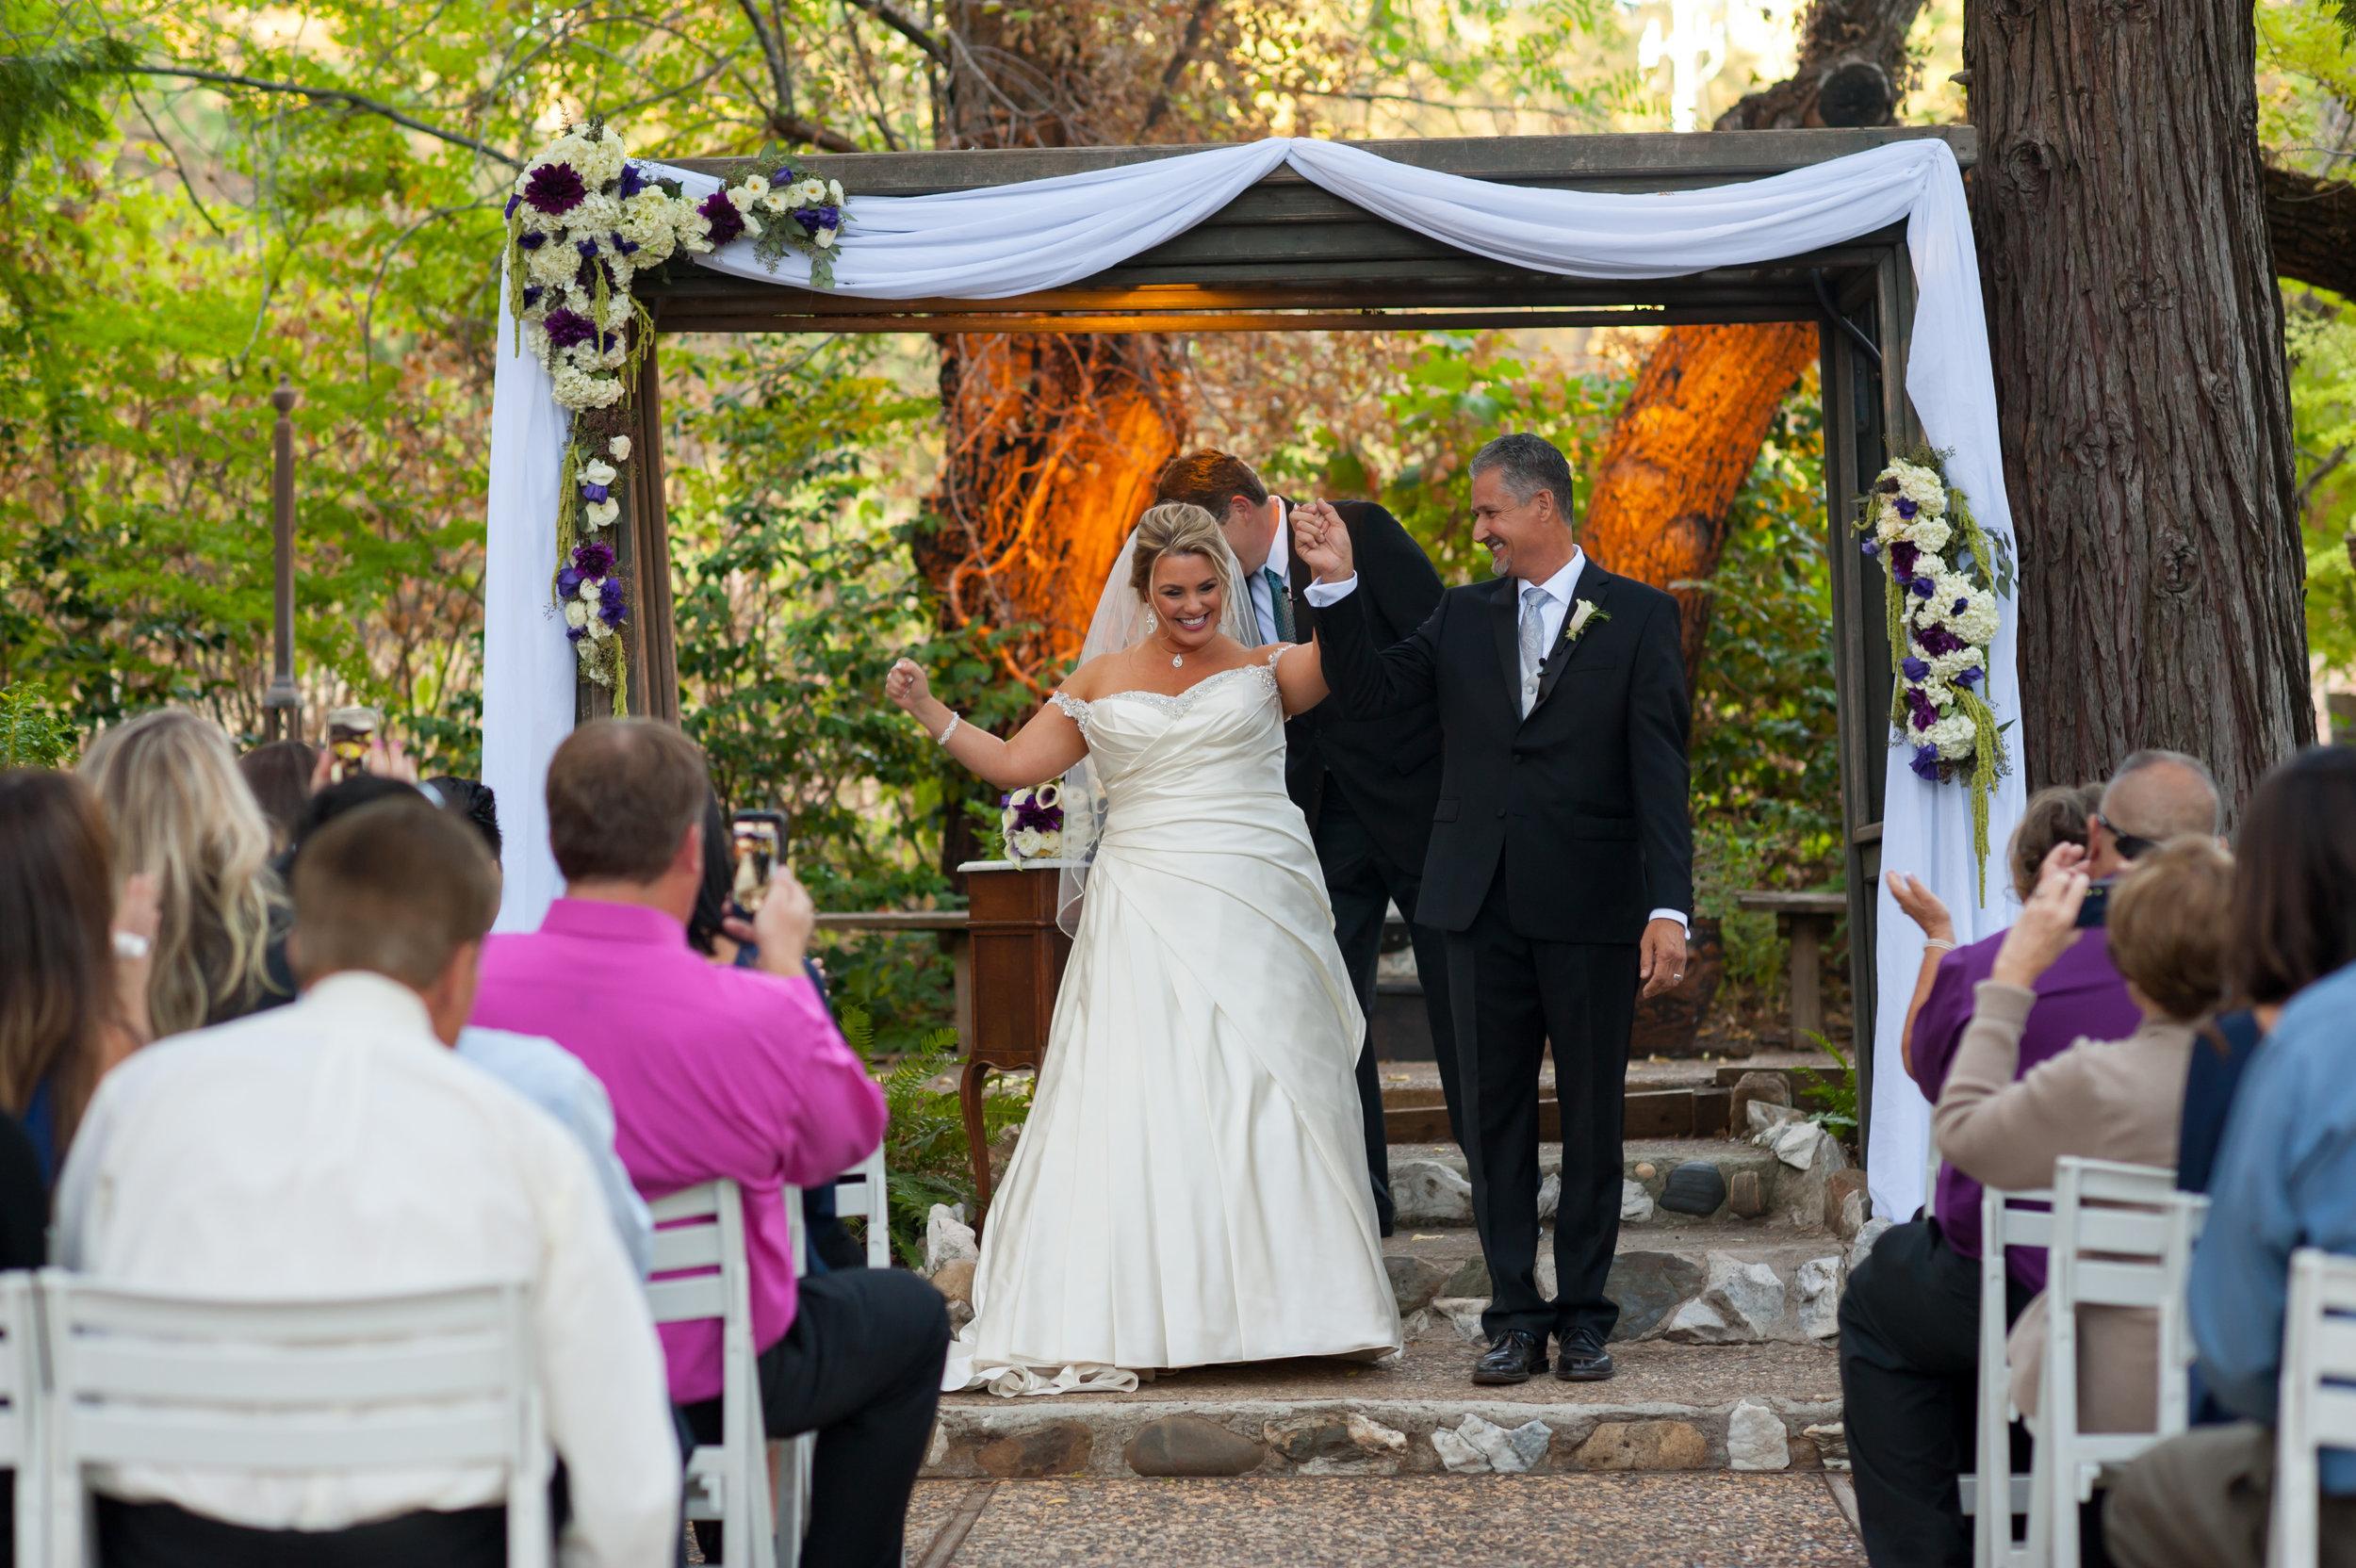 kara-craig-038-monte-verde-inn-sacramento-wedding-photographer-katherine-nicole-photography.JPG